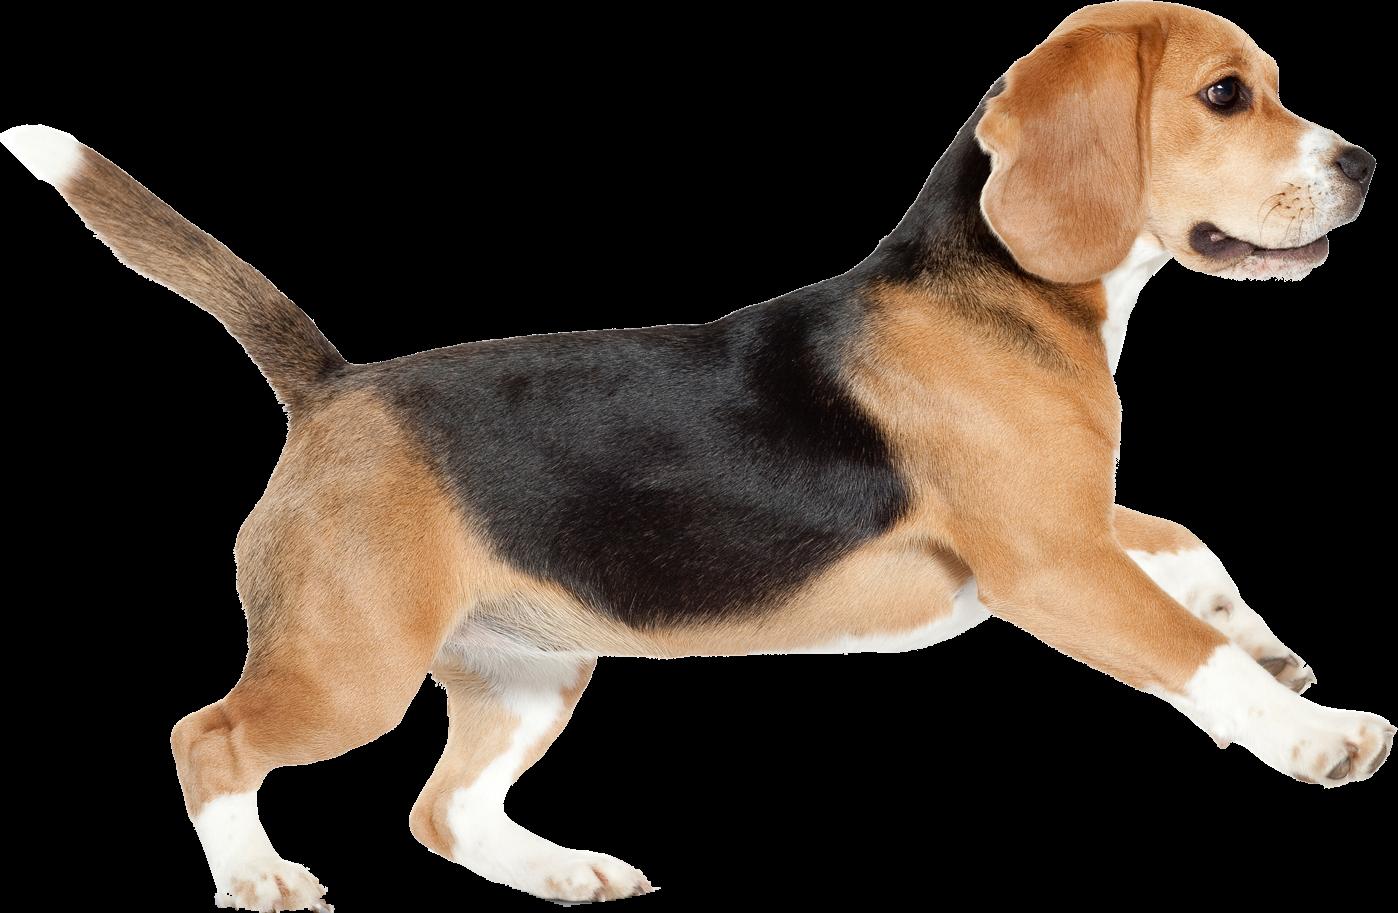 Beagle dog clipart freeuse library beagle dog - Sticker by Taliafera freeuse library